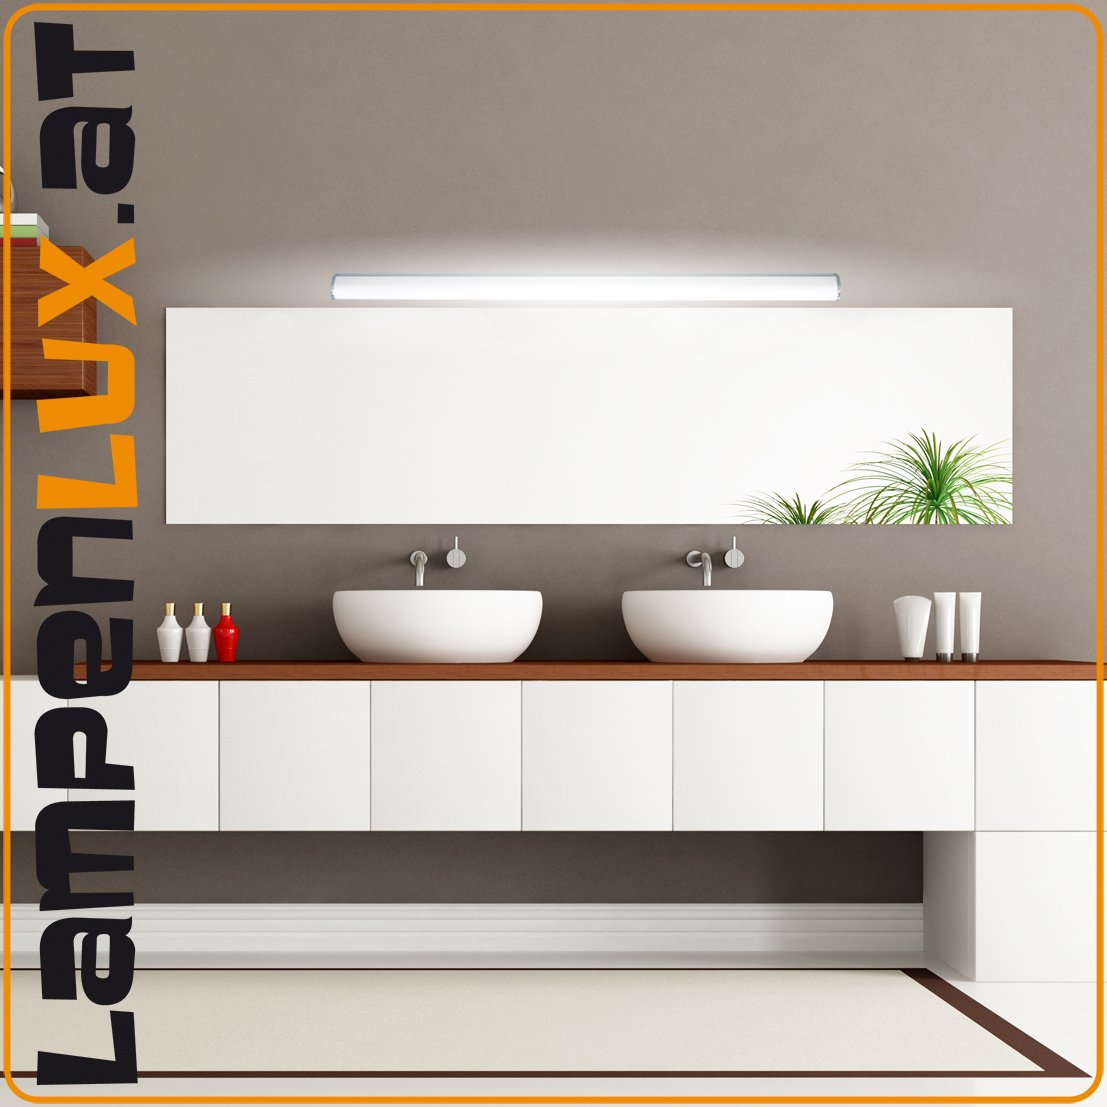 Badezimmer Spiegel Lampe XY04 – Hitoiro